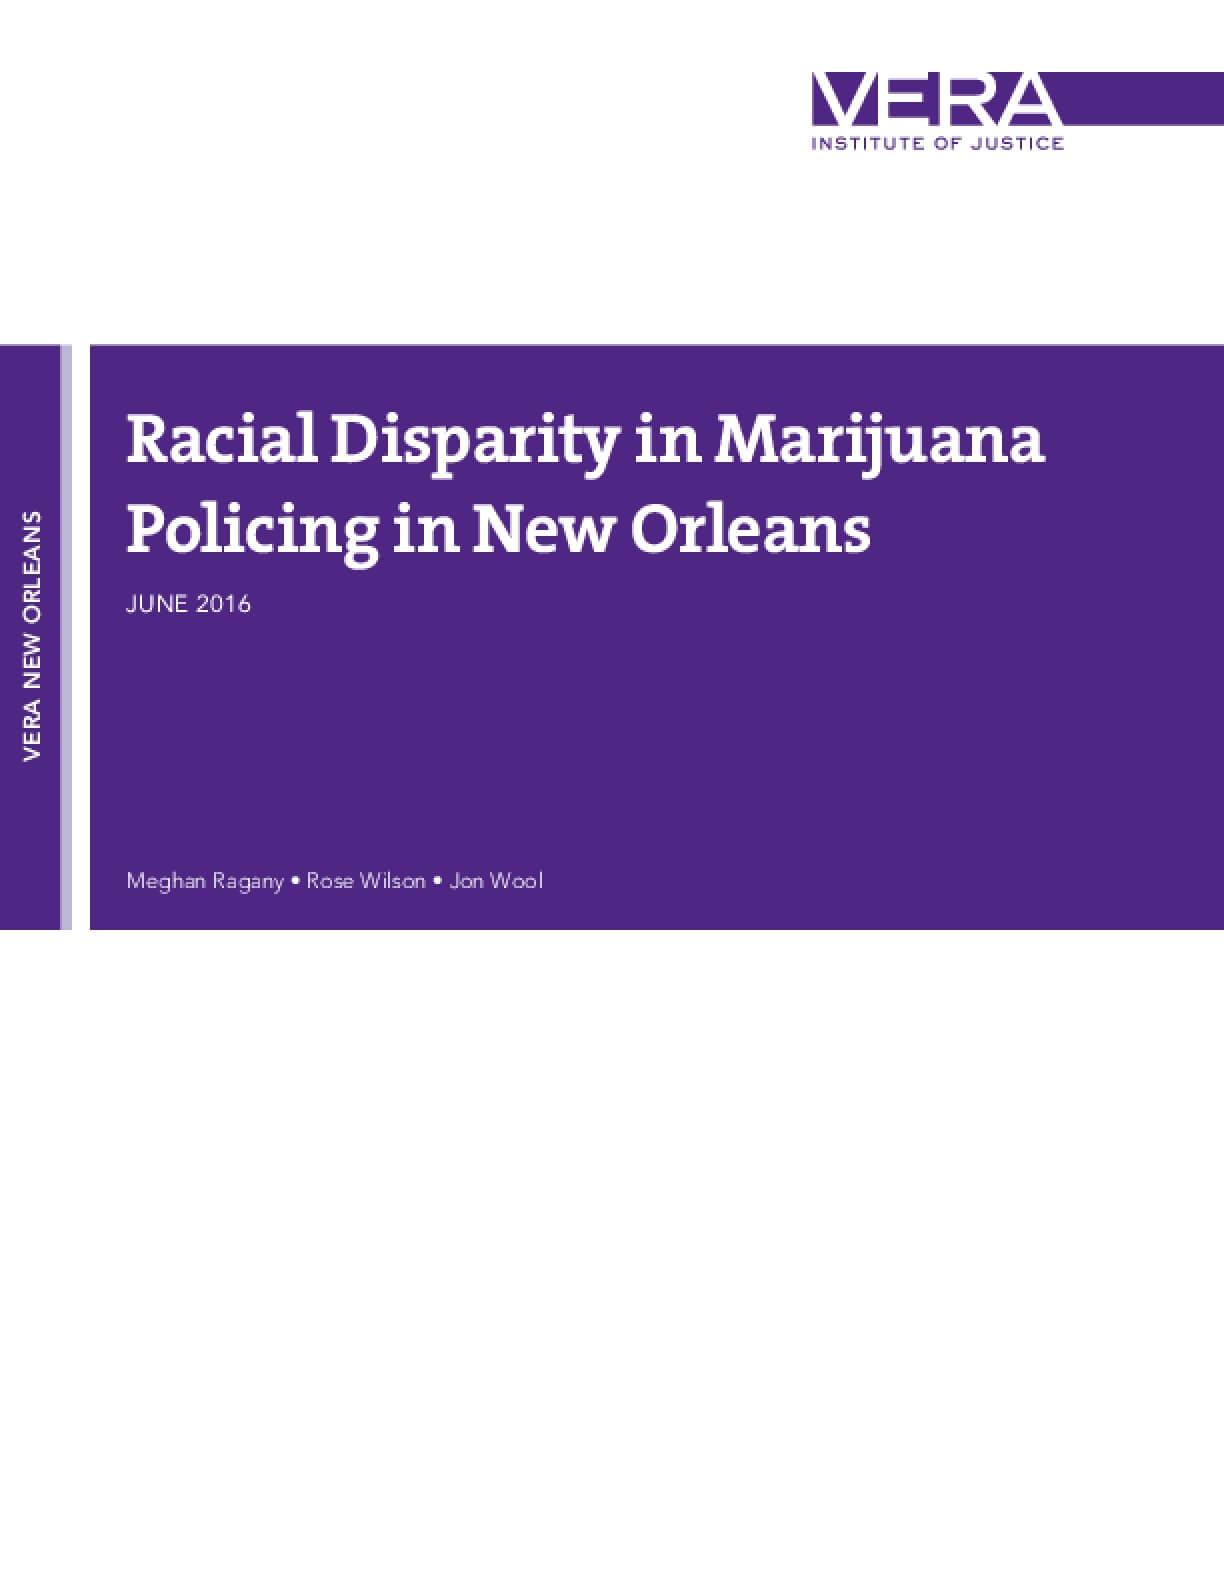 Racial Disparity in Marijuana Policing in New Orleans